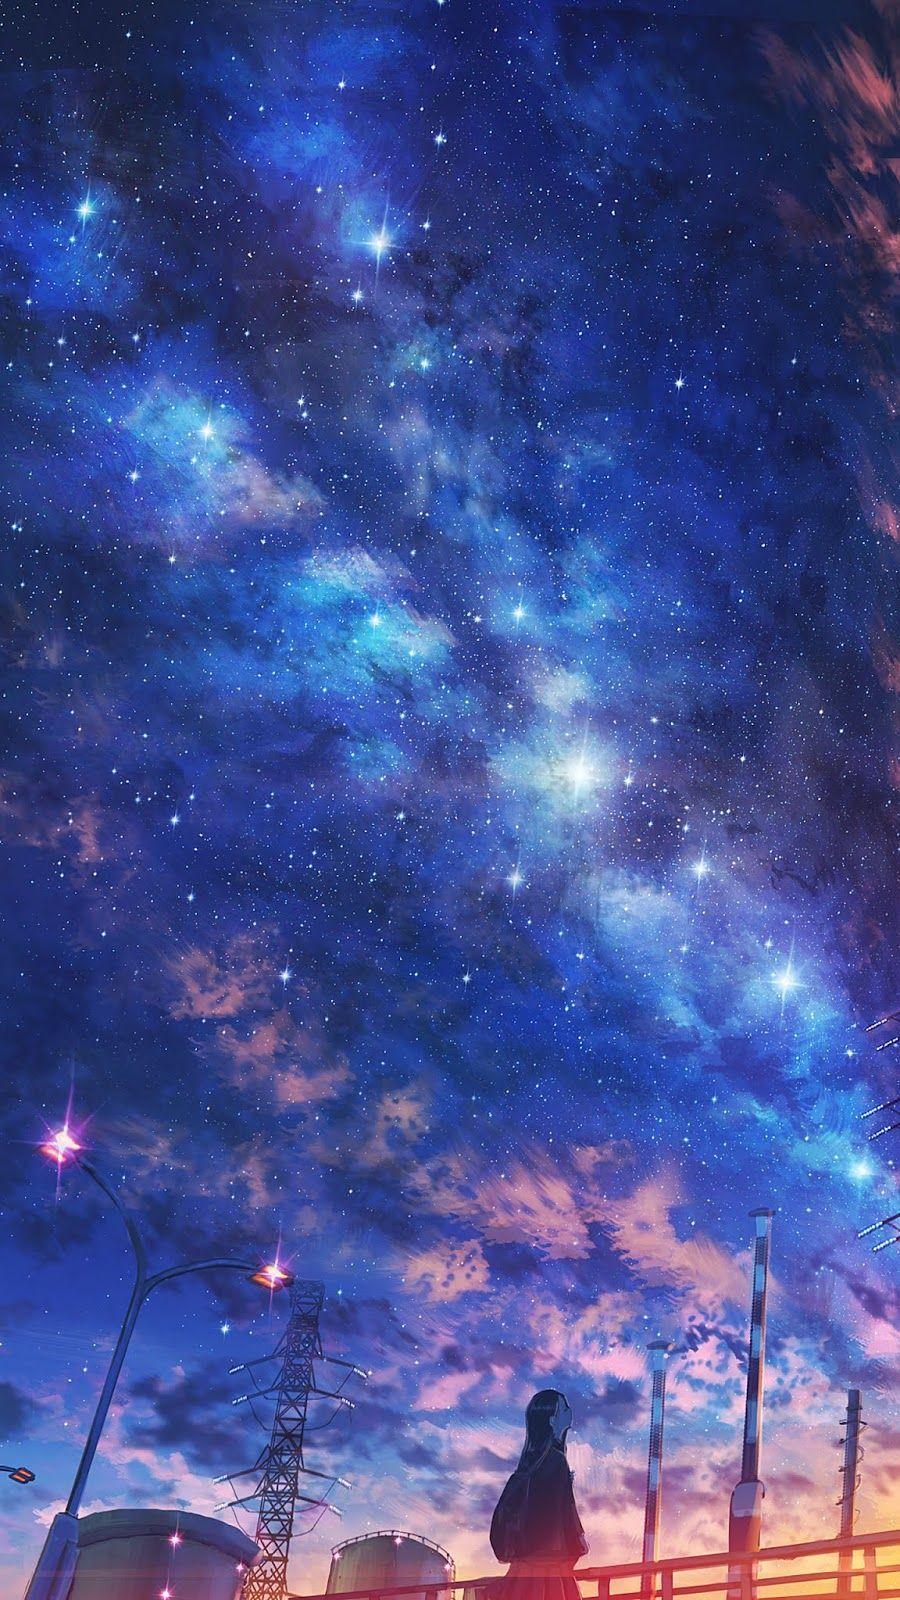 Gece Gokyuzu Altinda Pemandangan Anime Fotografi Alam Pemandangan Anime night scenery wallpaper